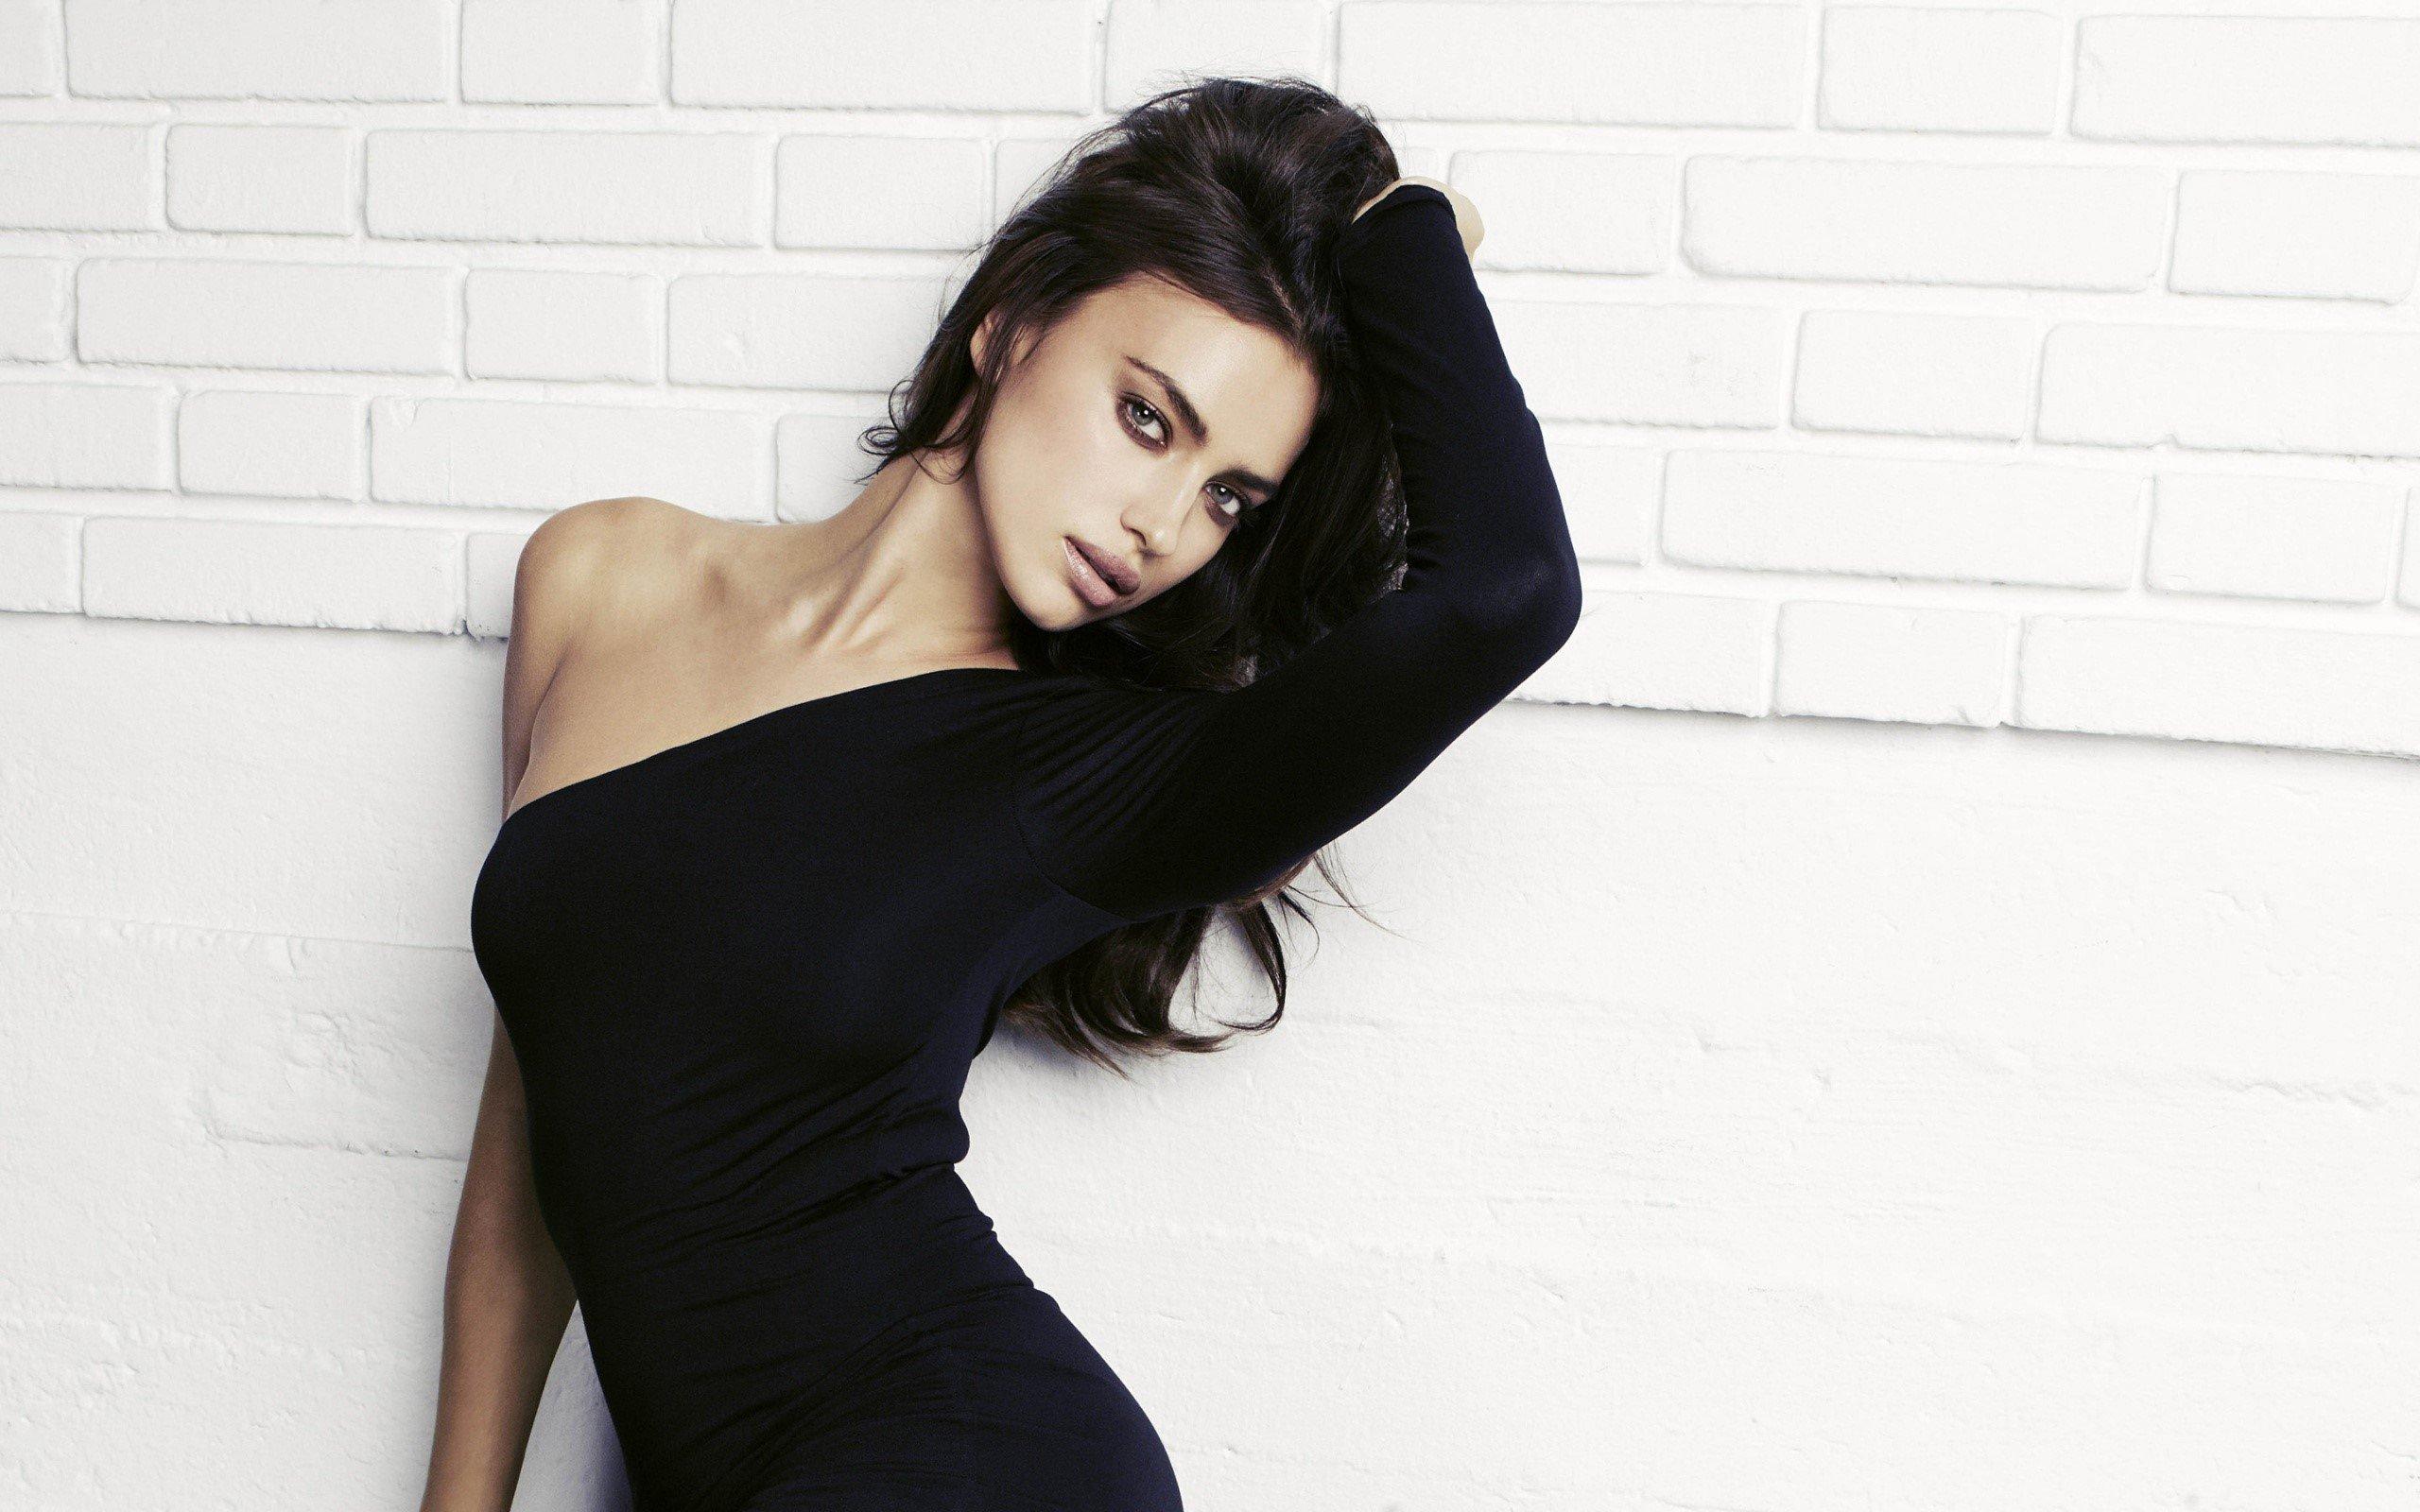 Fondos de pantalla Irina Shayk en vestido negro